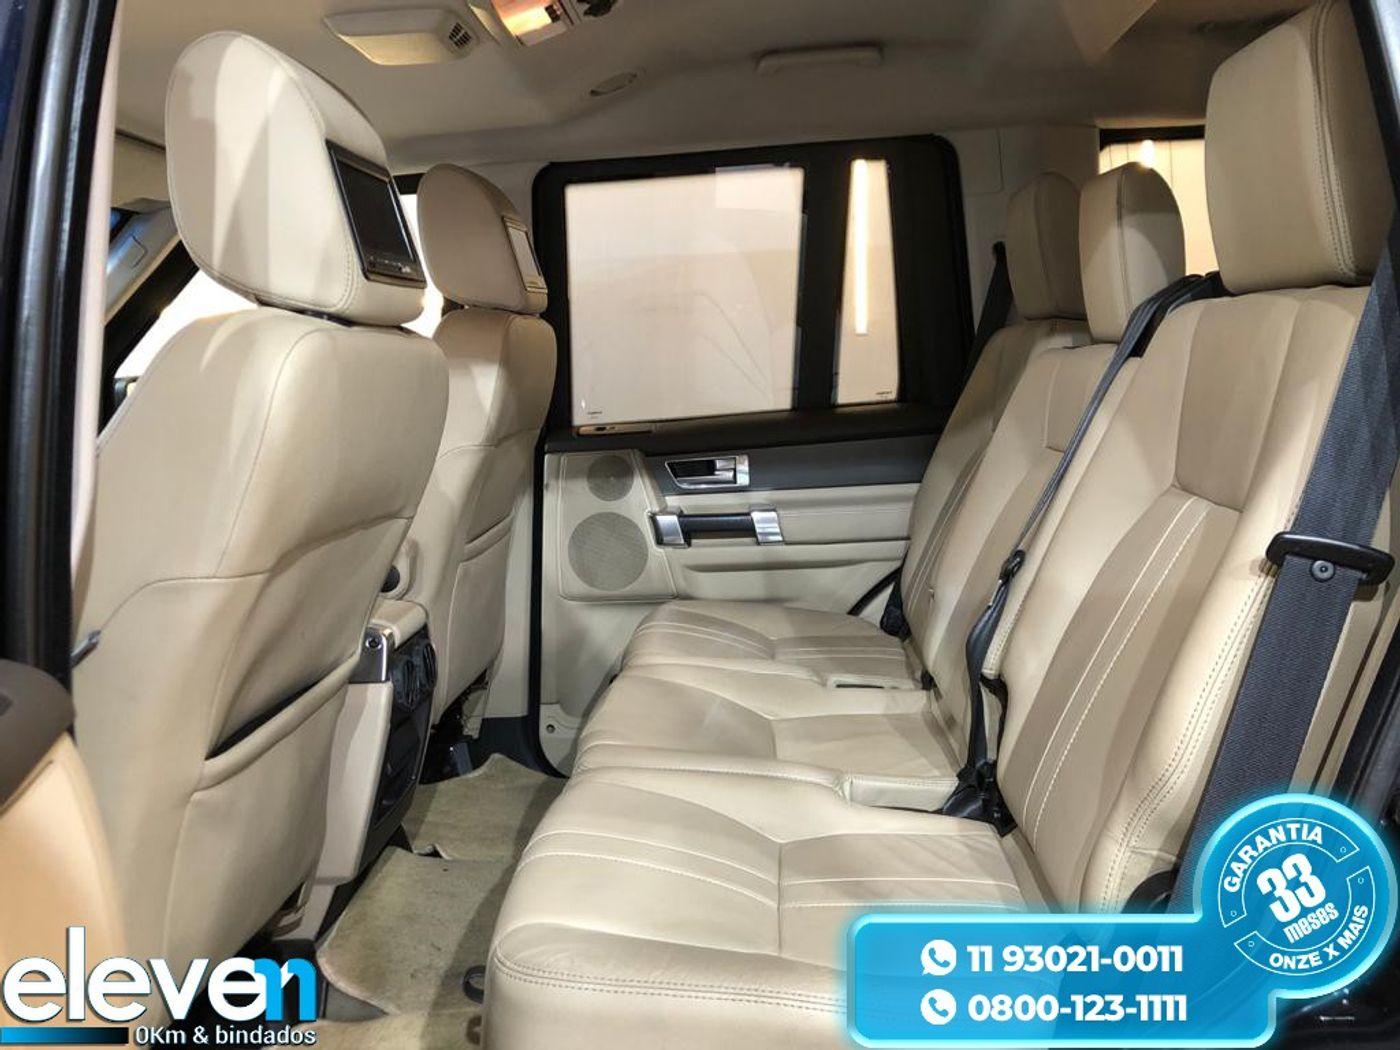 Land Rover Discovery4 SE 3.0 4x4 TDV6/SDV6 Die.Aut.